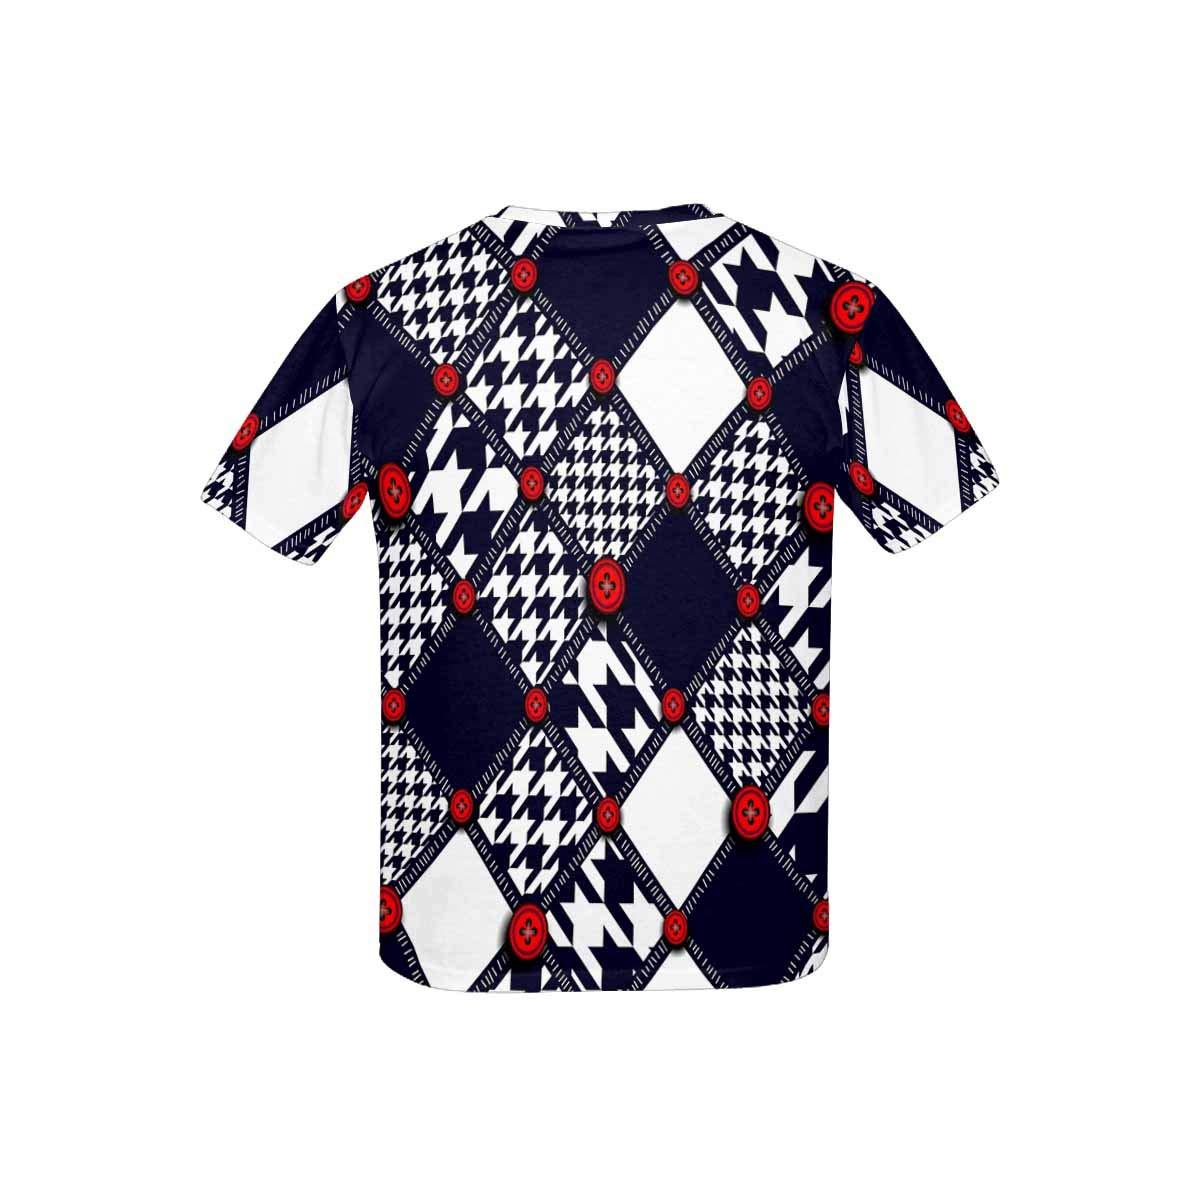 XS-XL INTERESTPRINT T-Shirt in Youth